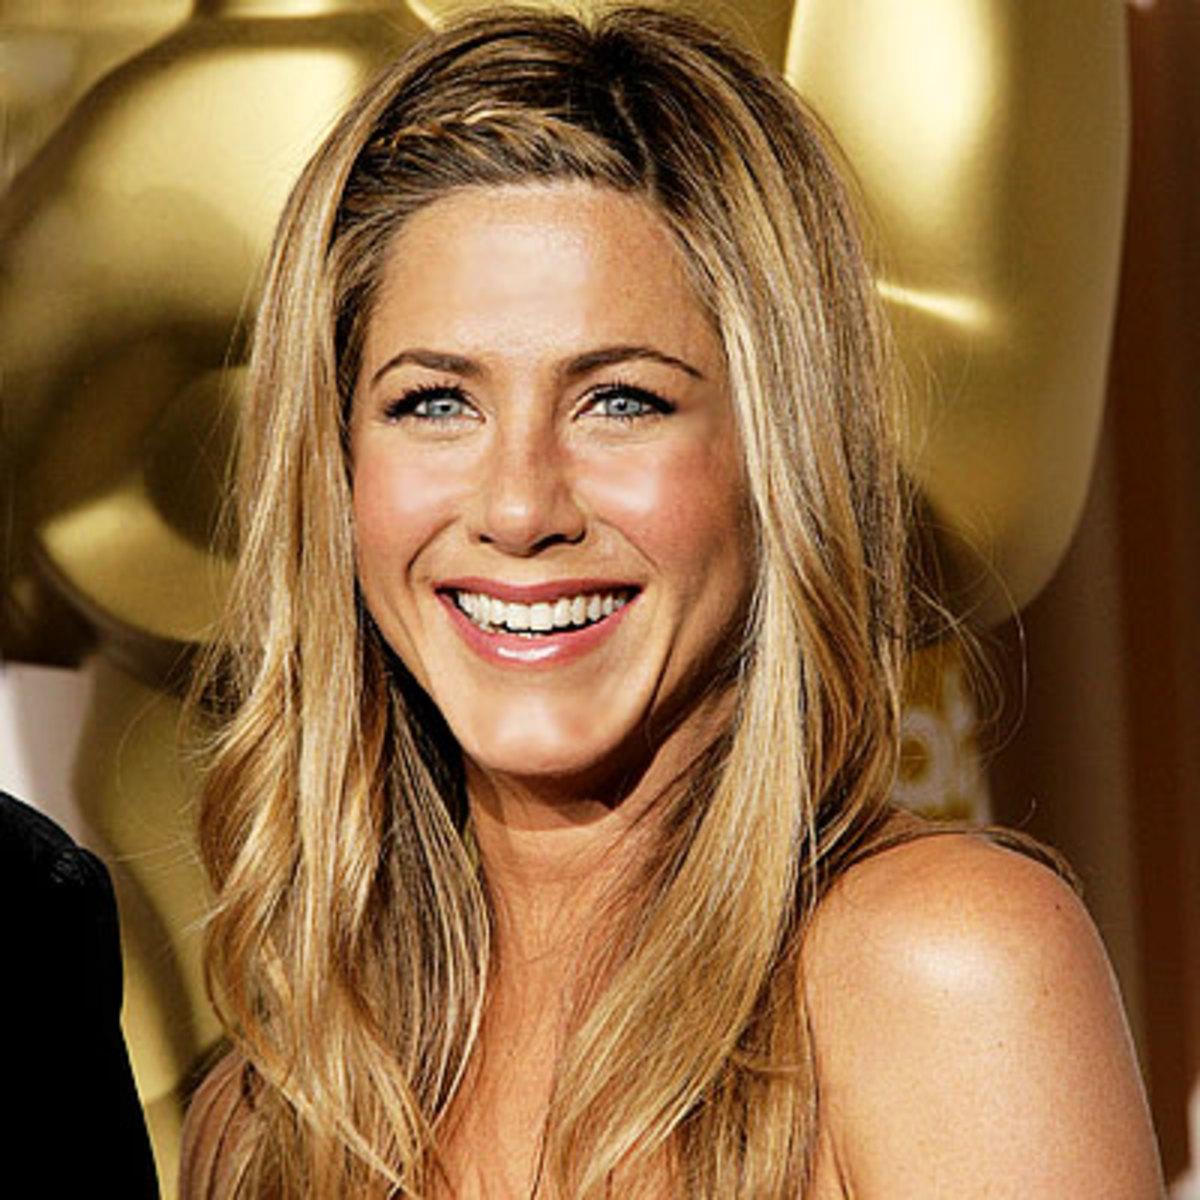 Jennifer Aniston always get top choice for best hair.